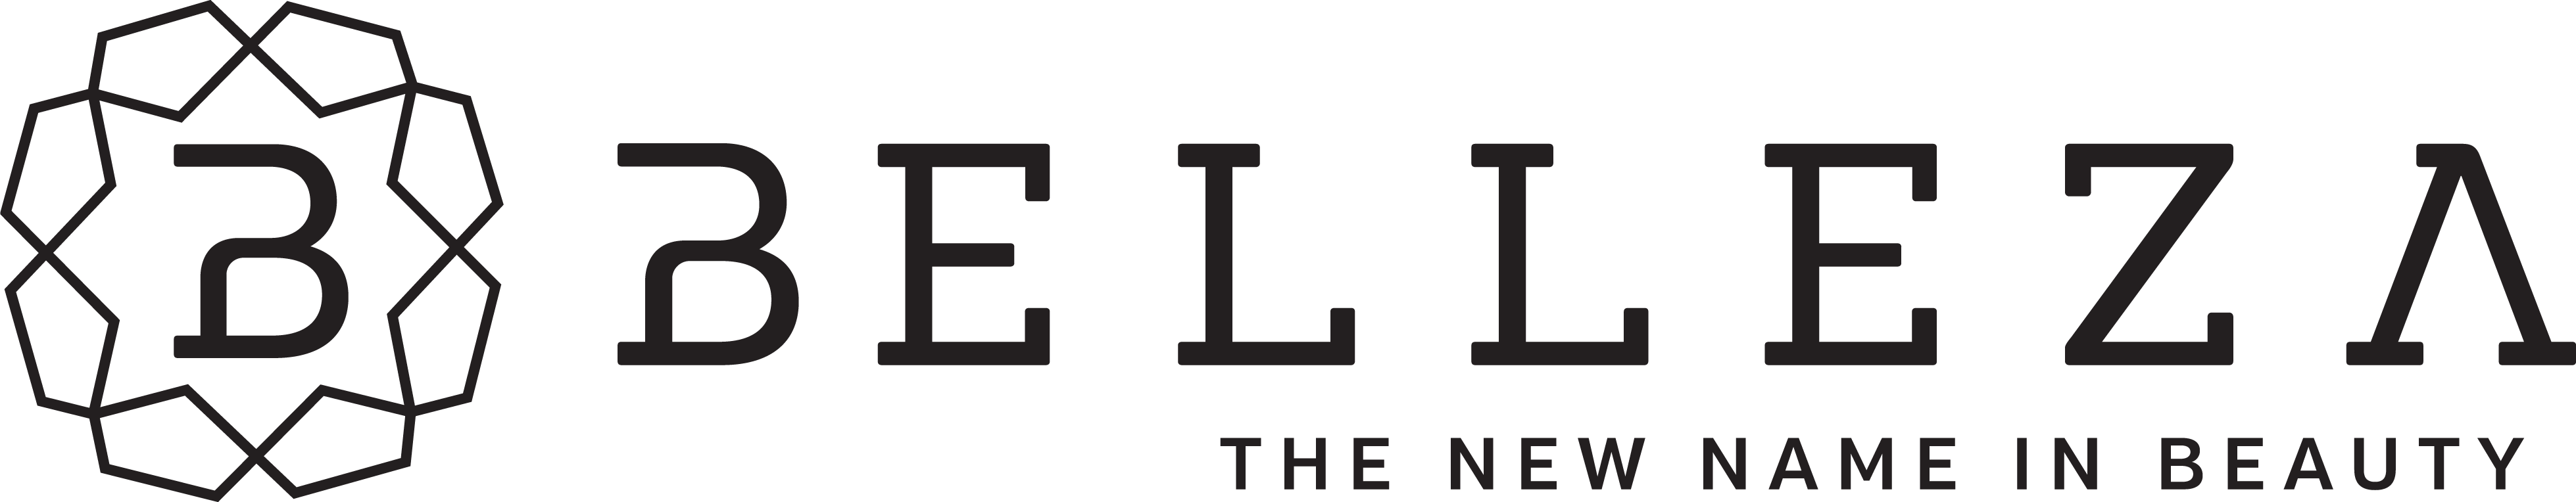 Belleza Flooring Xtra Brand Logo